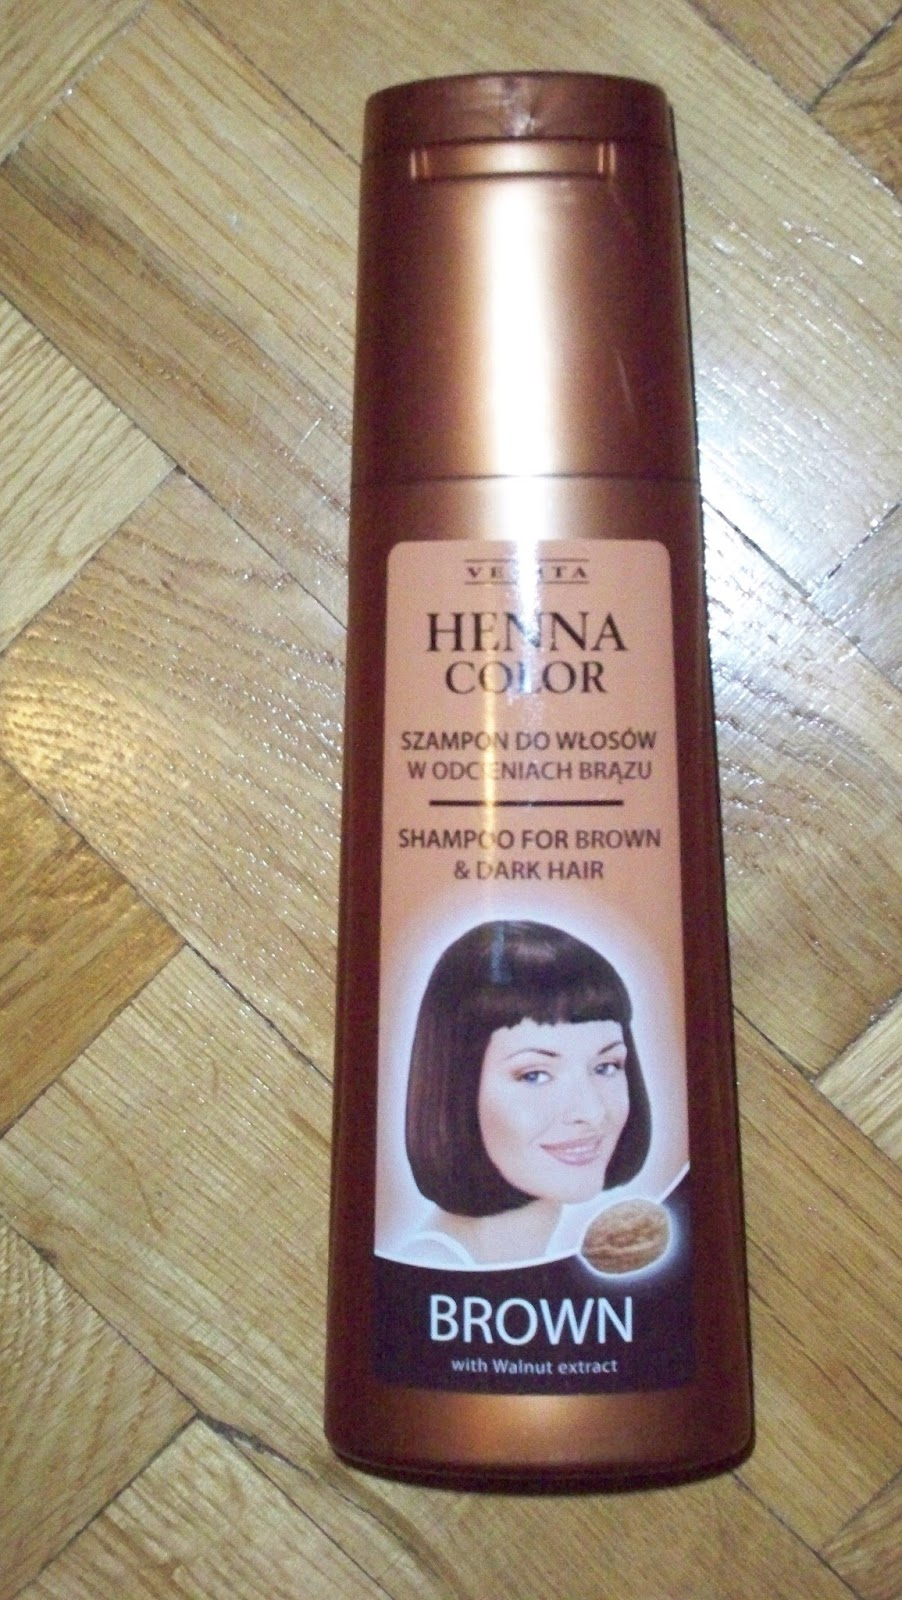 Venita Henna Color Szampon